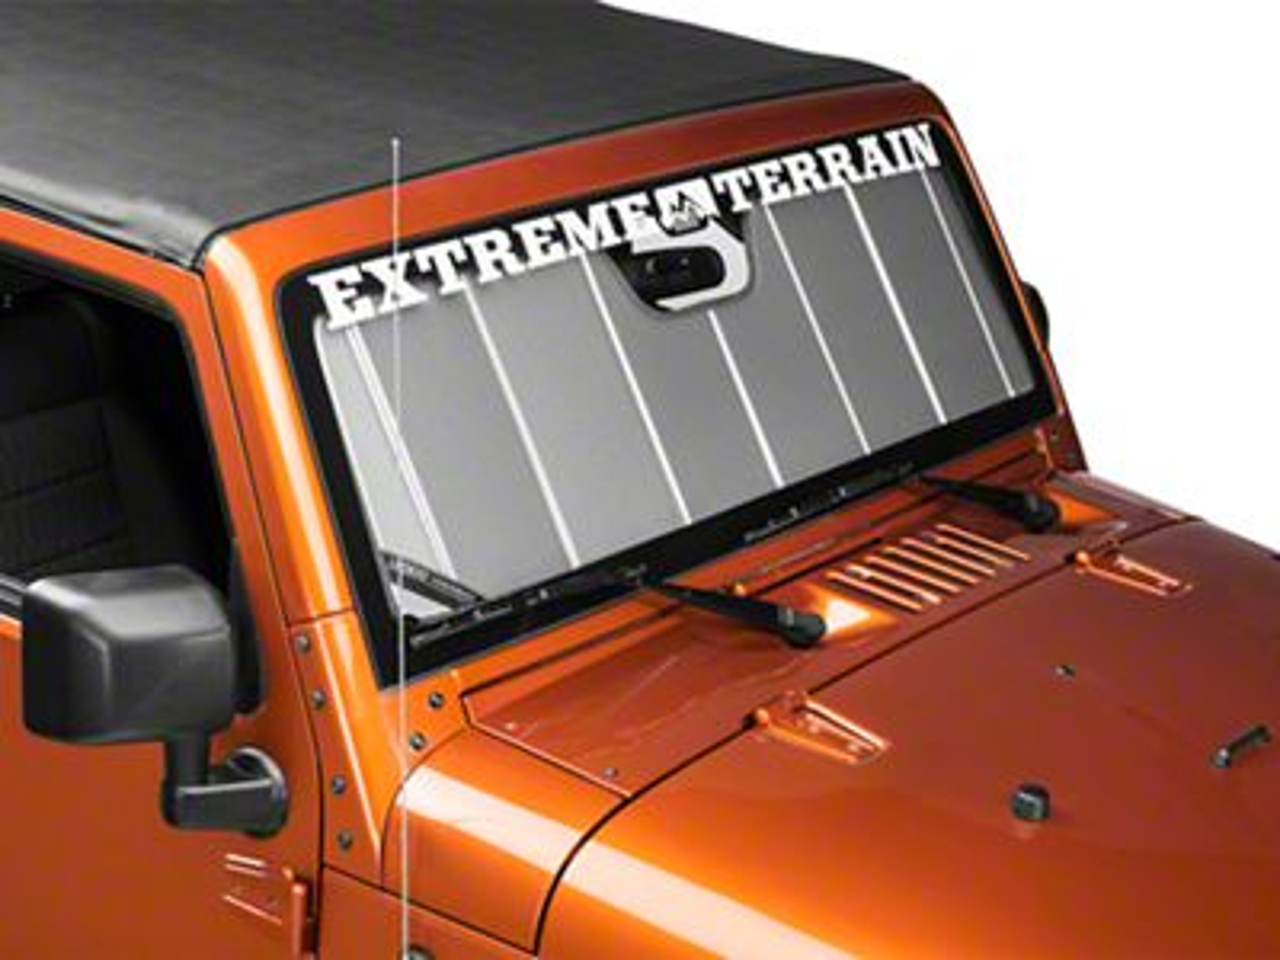 1 Pack Laminate Material Covercraft UV10637SV Silver UVS 100 Custom Fit Sunscreen for Select Jeep Wrangler Models